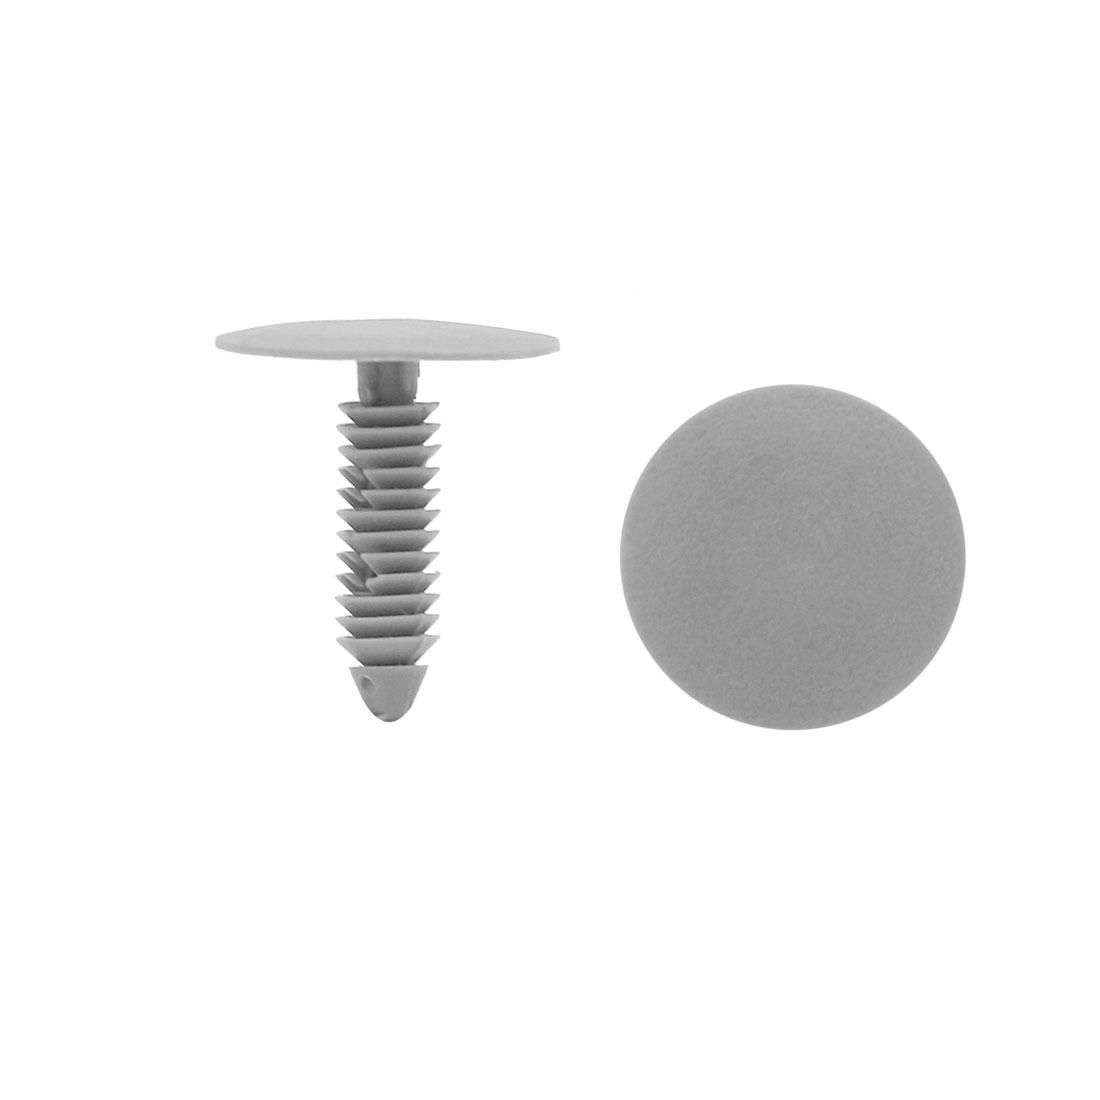 50Pcs 7mm Hole Plastic Push Type Rivet Fastener Door Bumper Pin Clips Gray